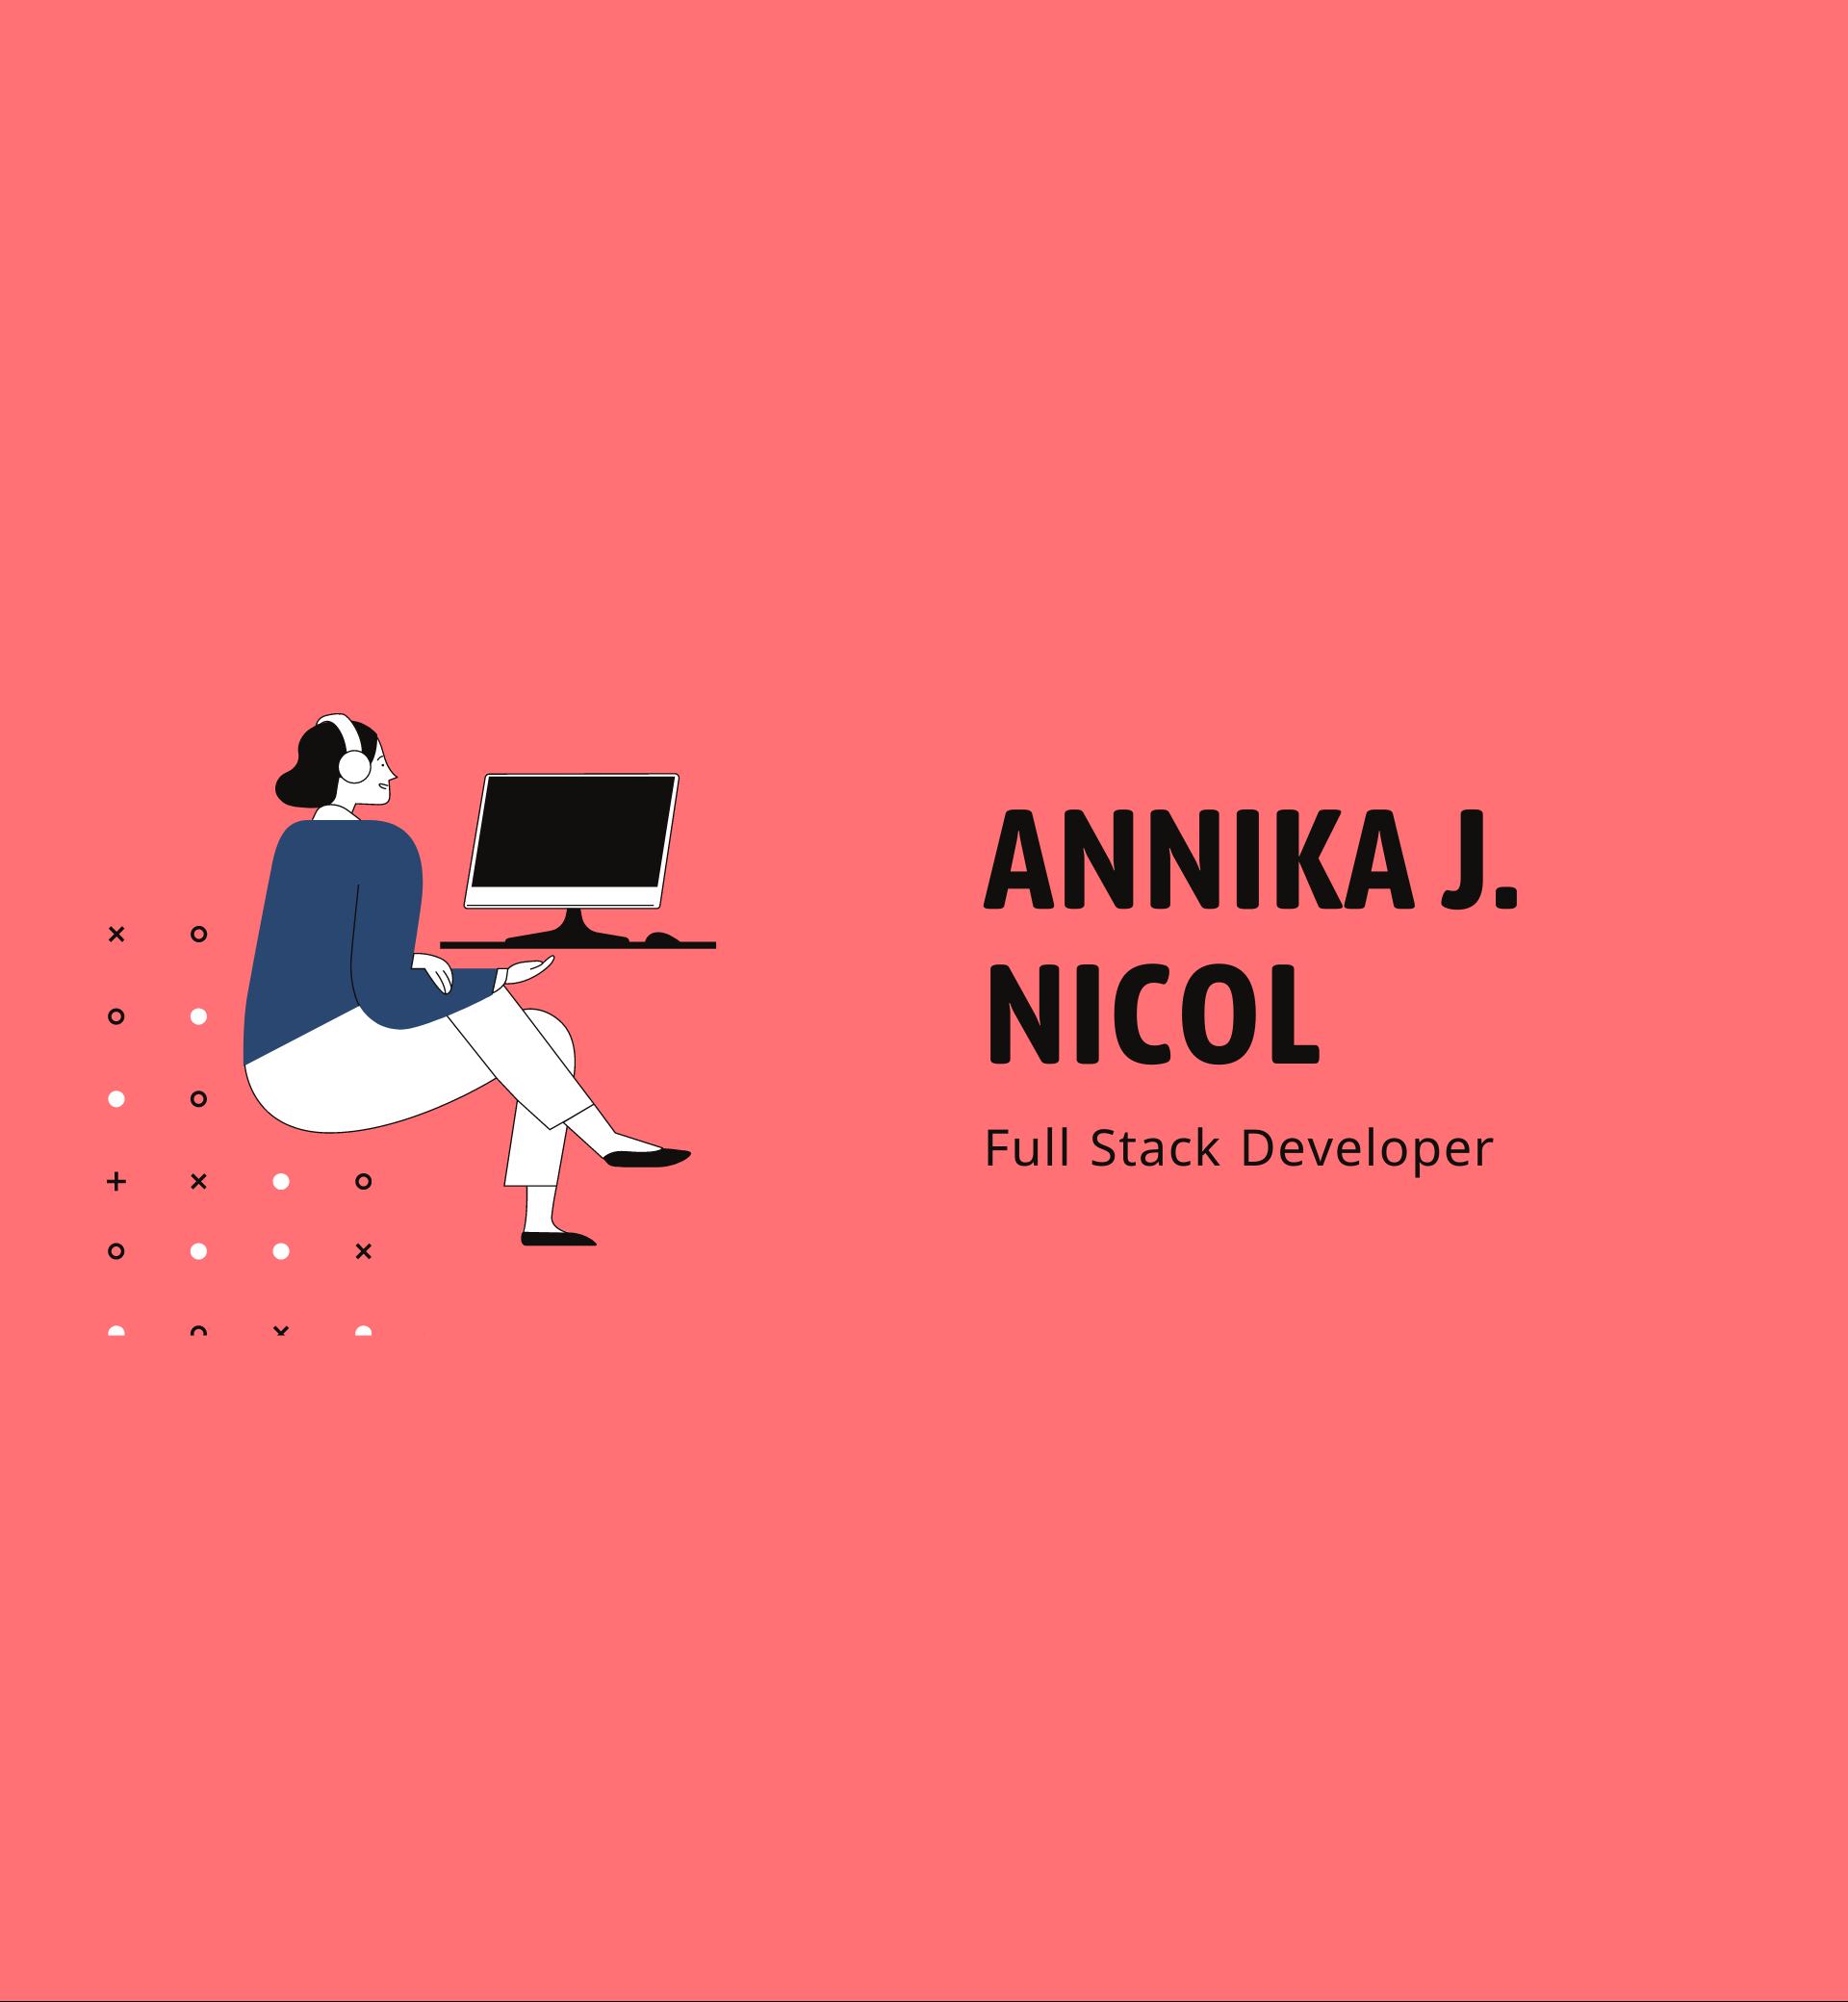 Annika J Nicol, Full stack Developer